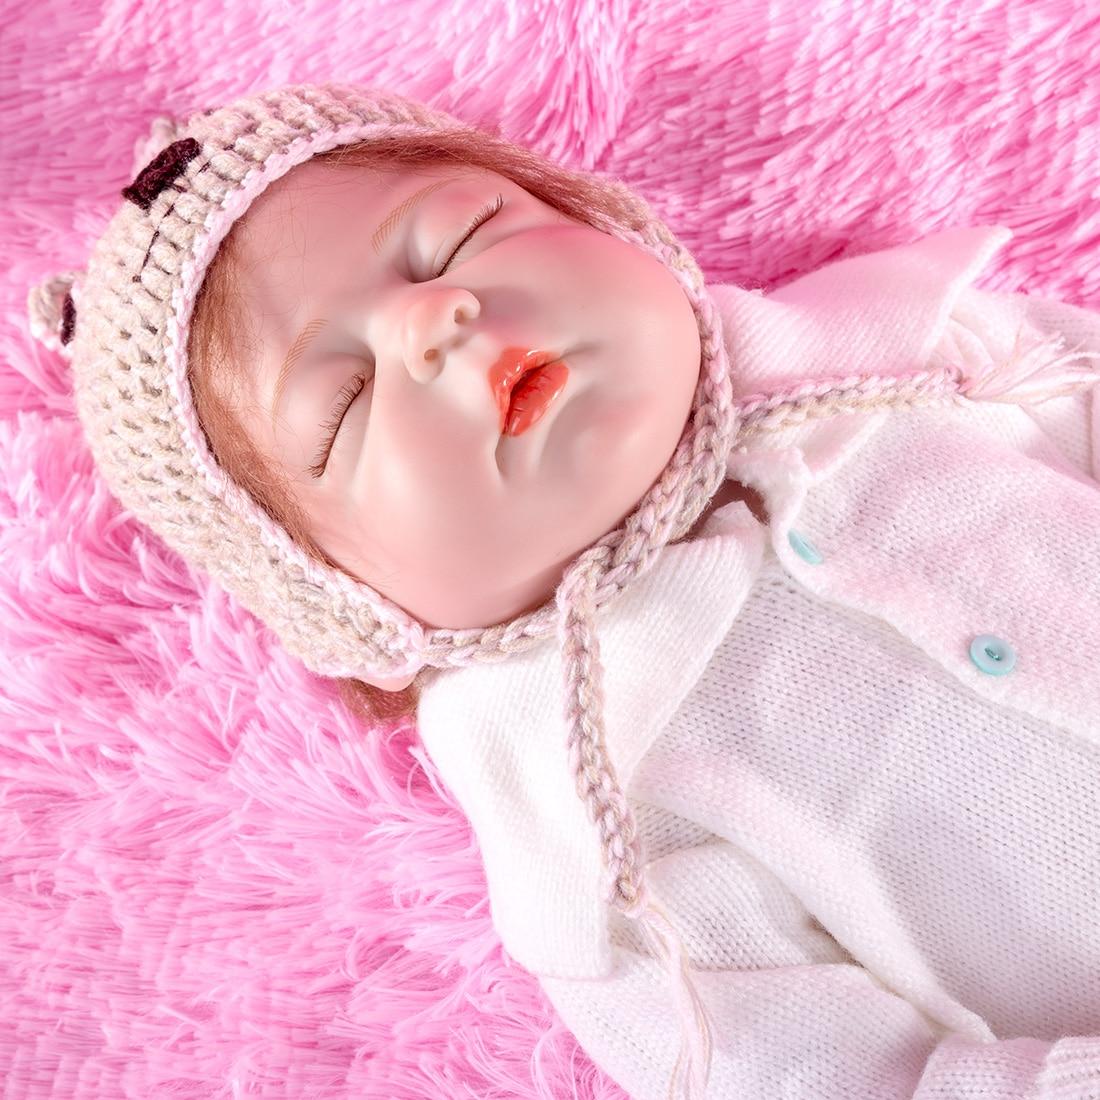 17.5 Inches Darren Cute Realistic Marilyn Reborn Baby Doll Boy Costume Collection Gift Set - Silicone Vinyl Body (Cloth Random)